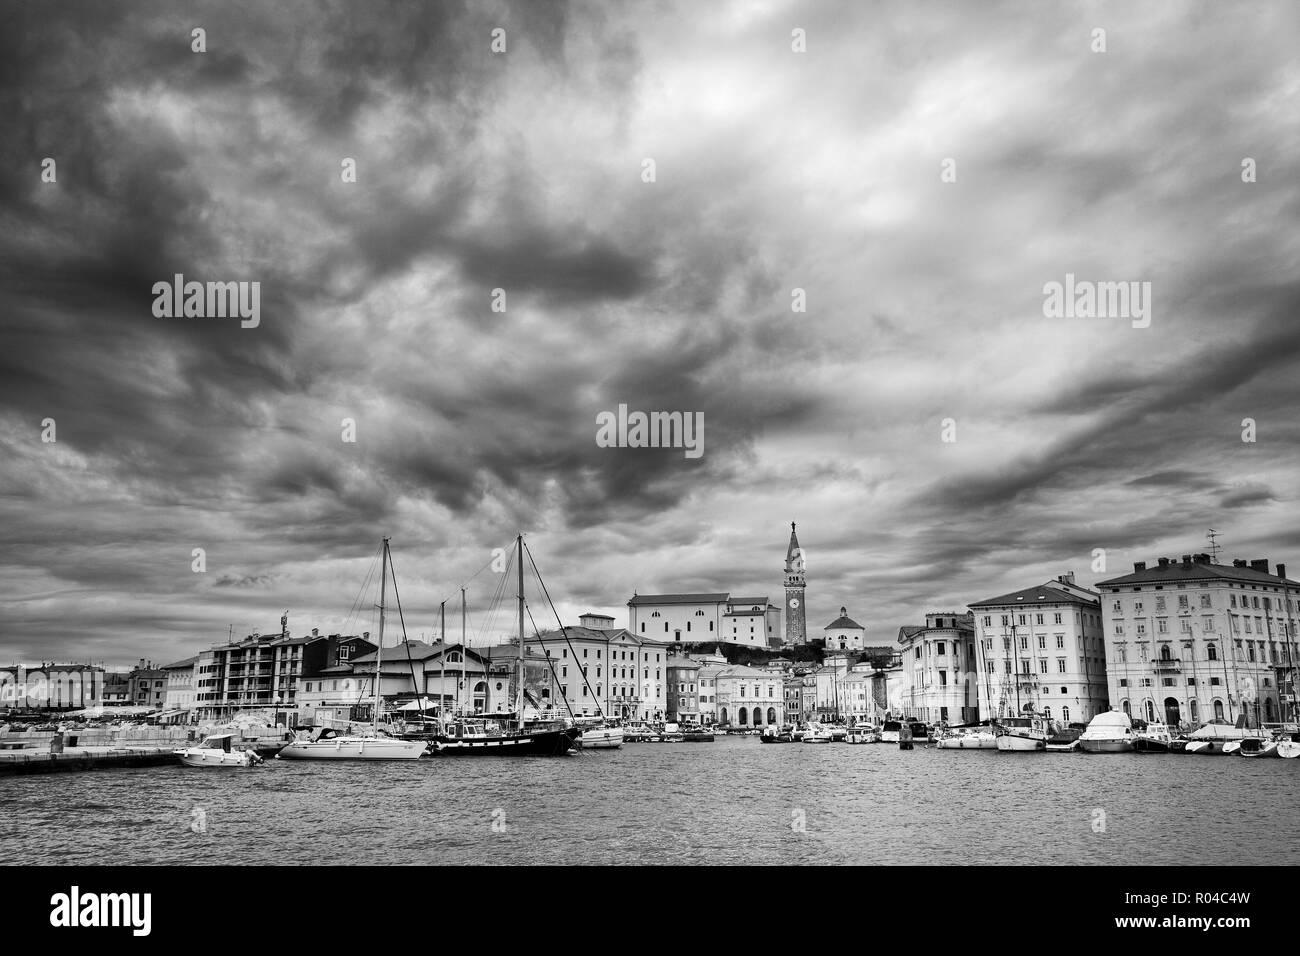 Piran harbour, Piran, Primorska, Adriatic Coast, Slovenia - Stock Image